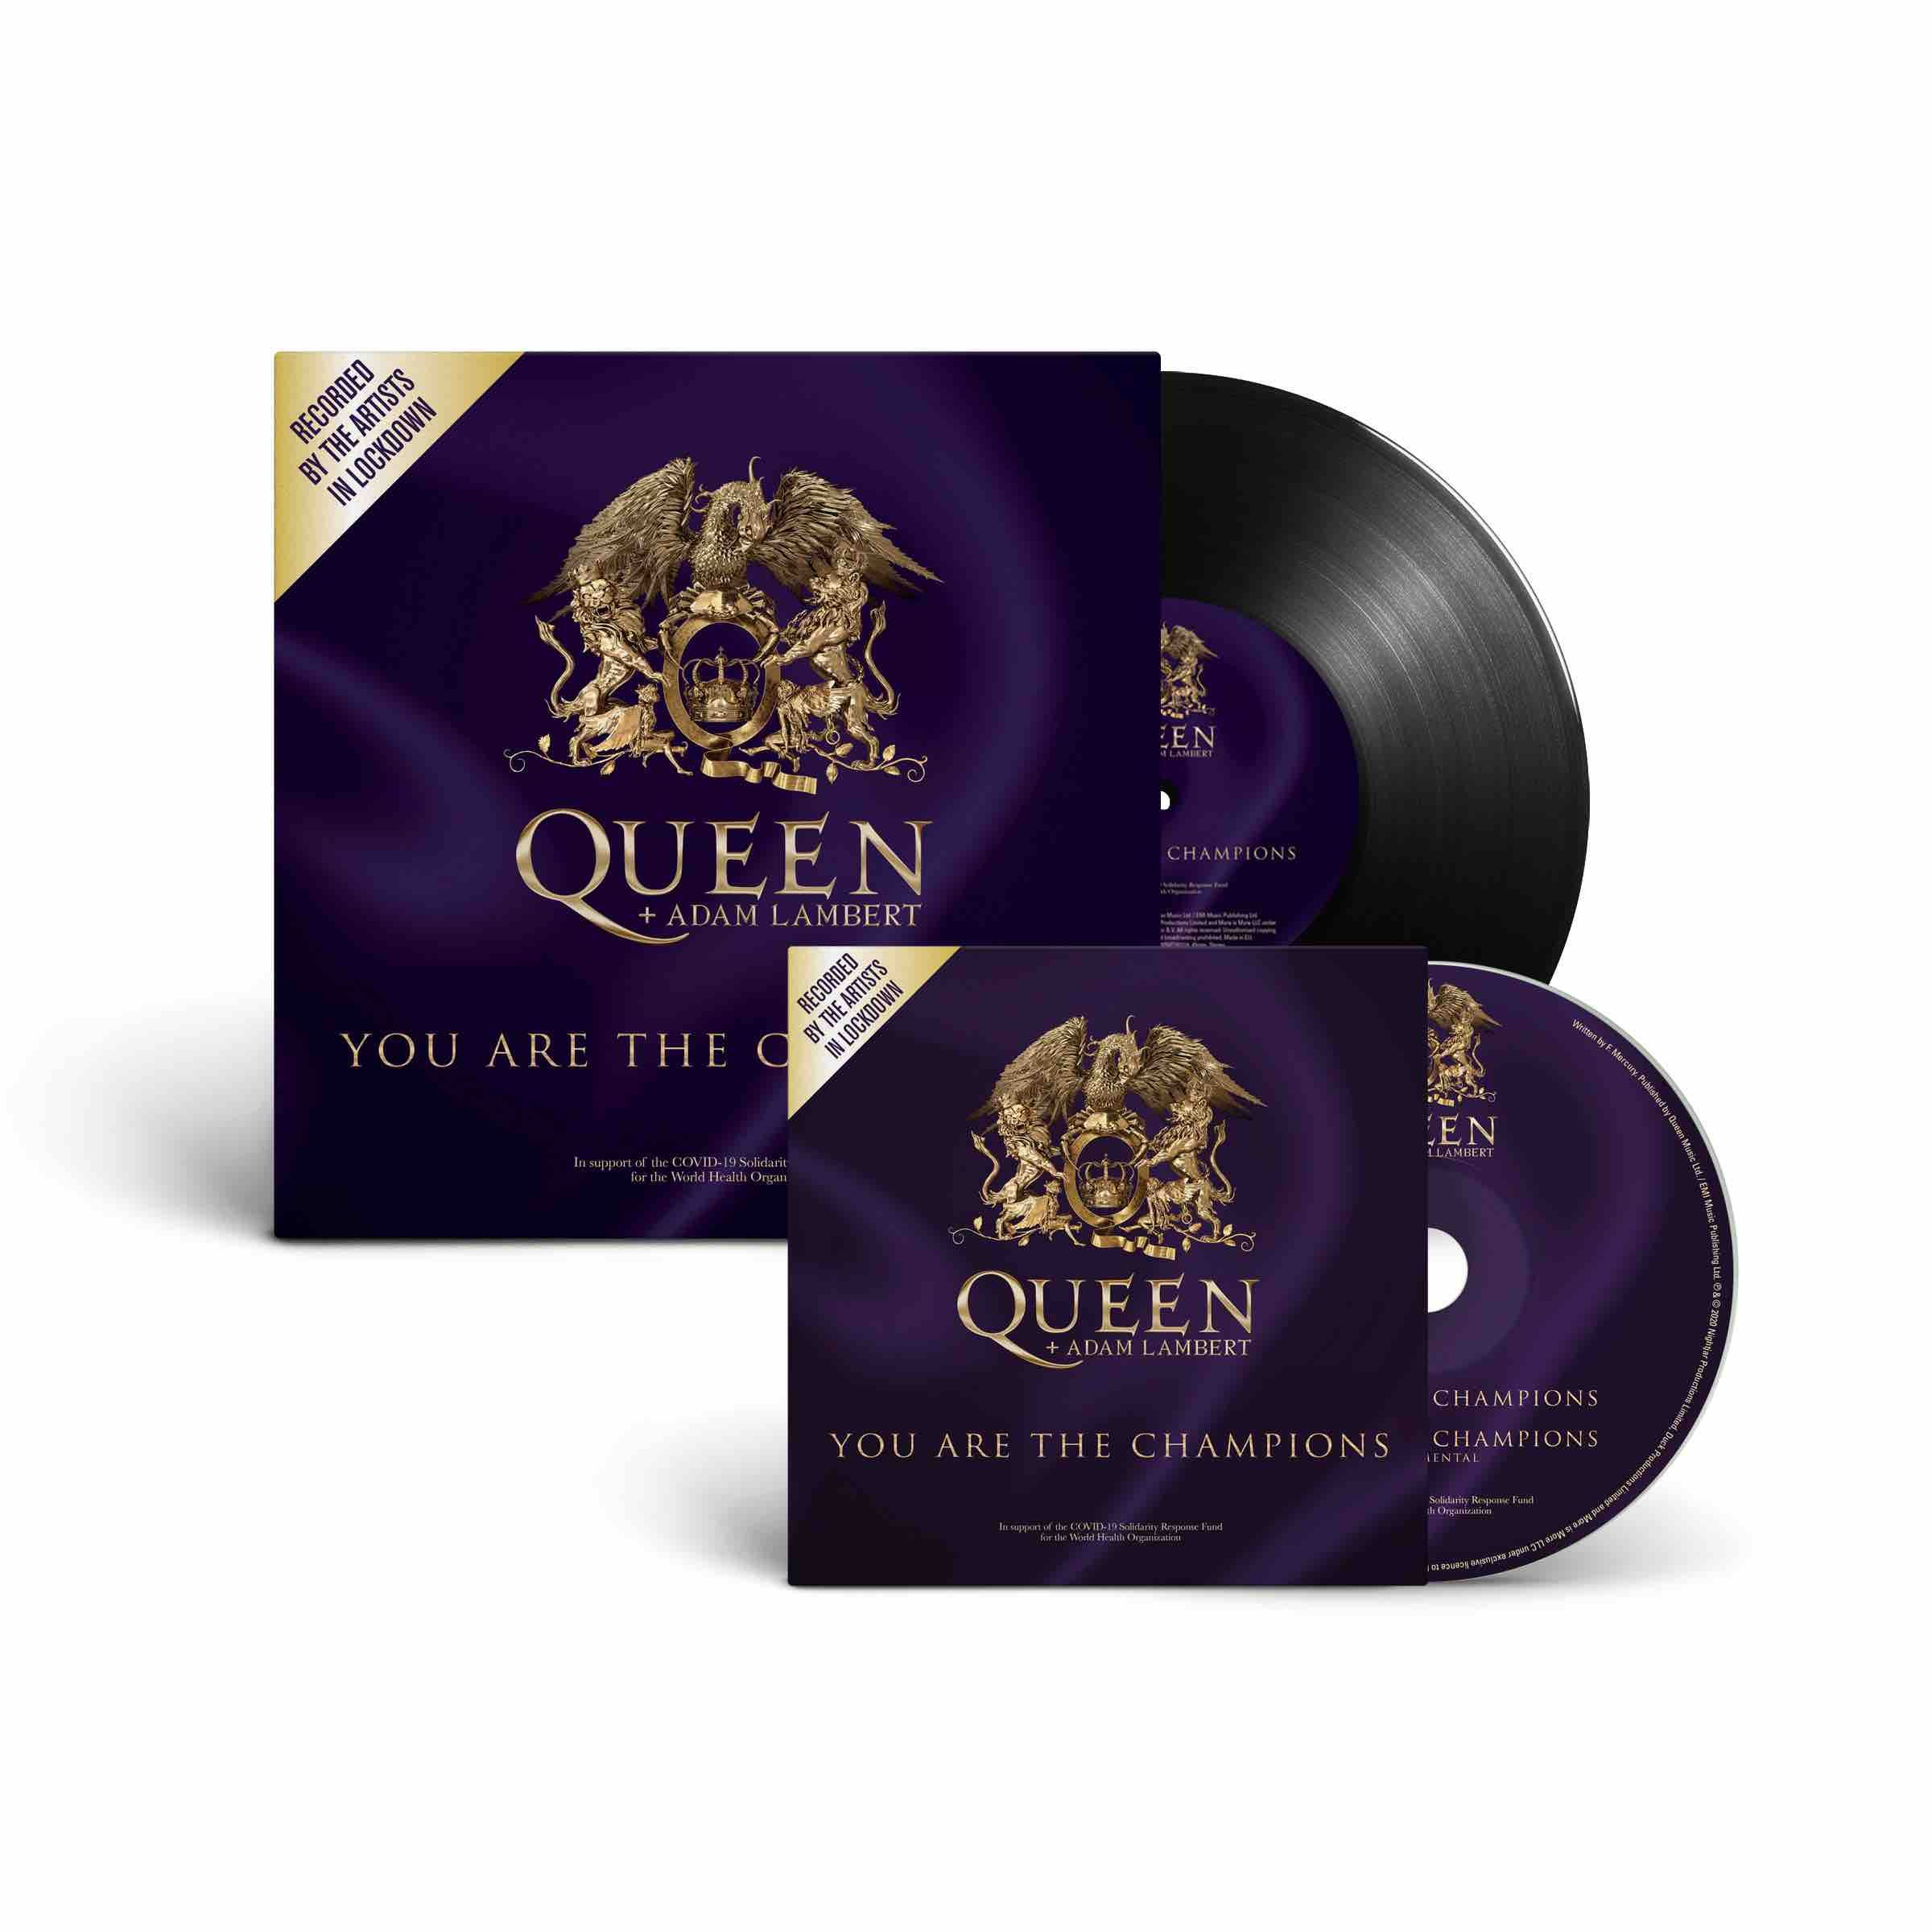 Queen Adam Lambert You Are The Champions